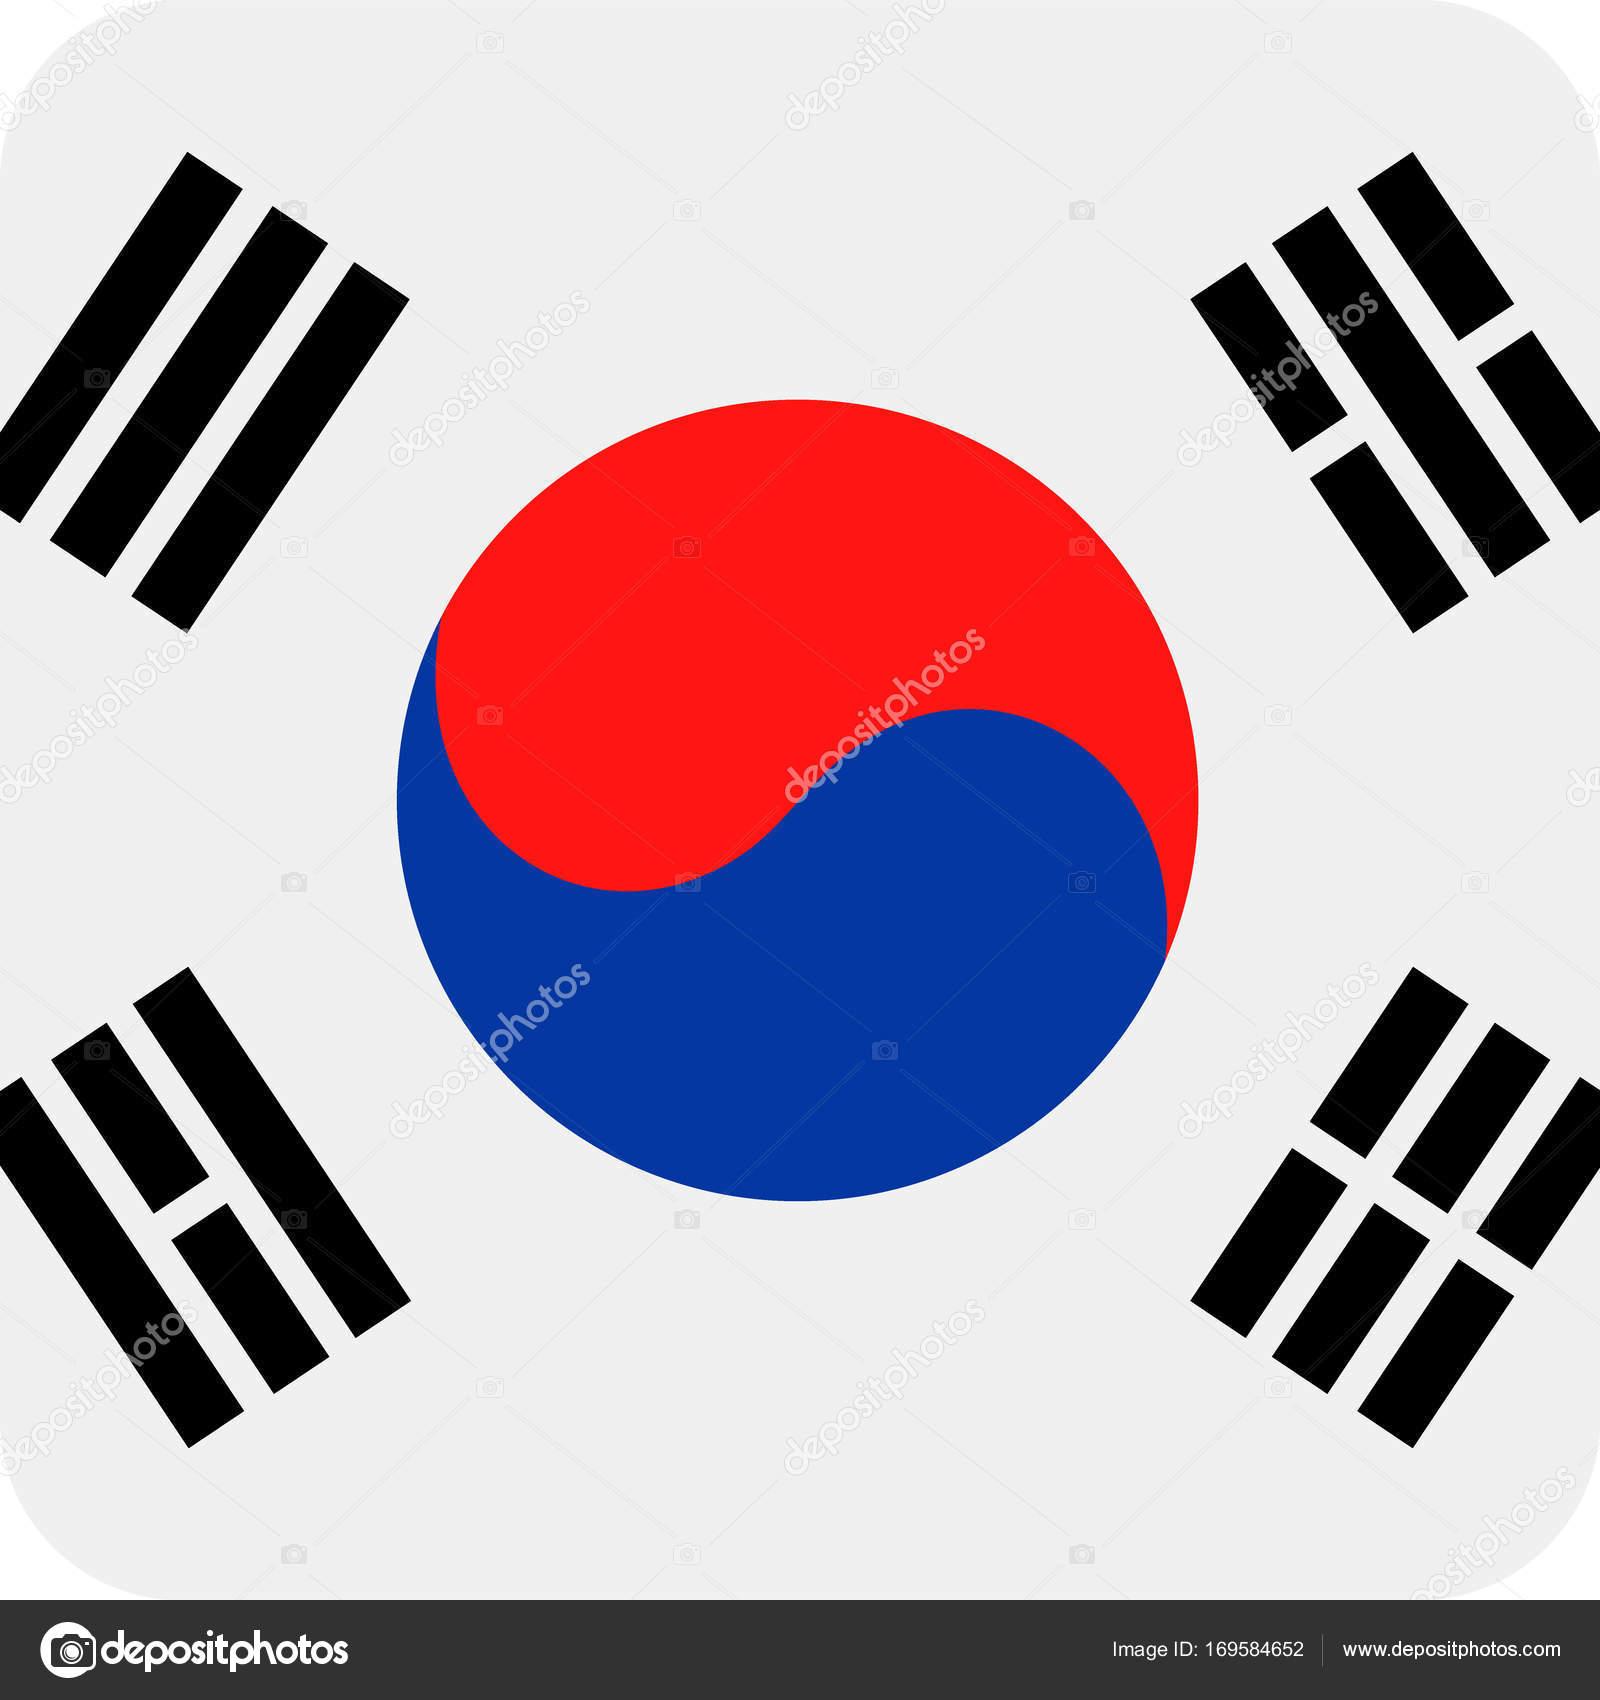 south korea flag vector square flat icon stock vector dikobrazik rh depositphotos com south korea flag vector download south korea flag vector free